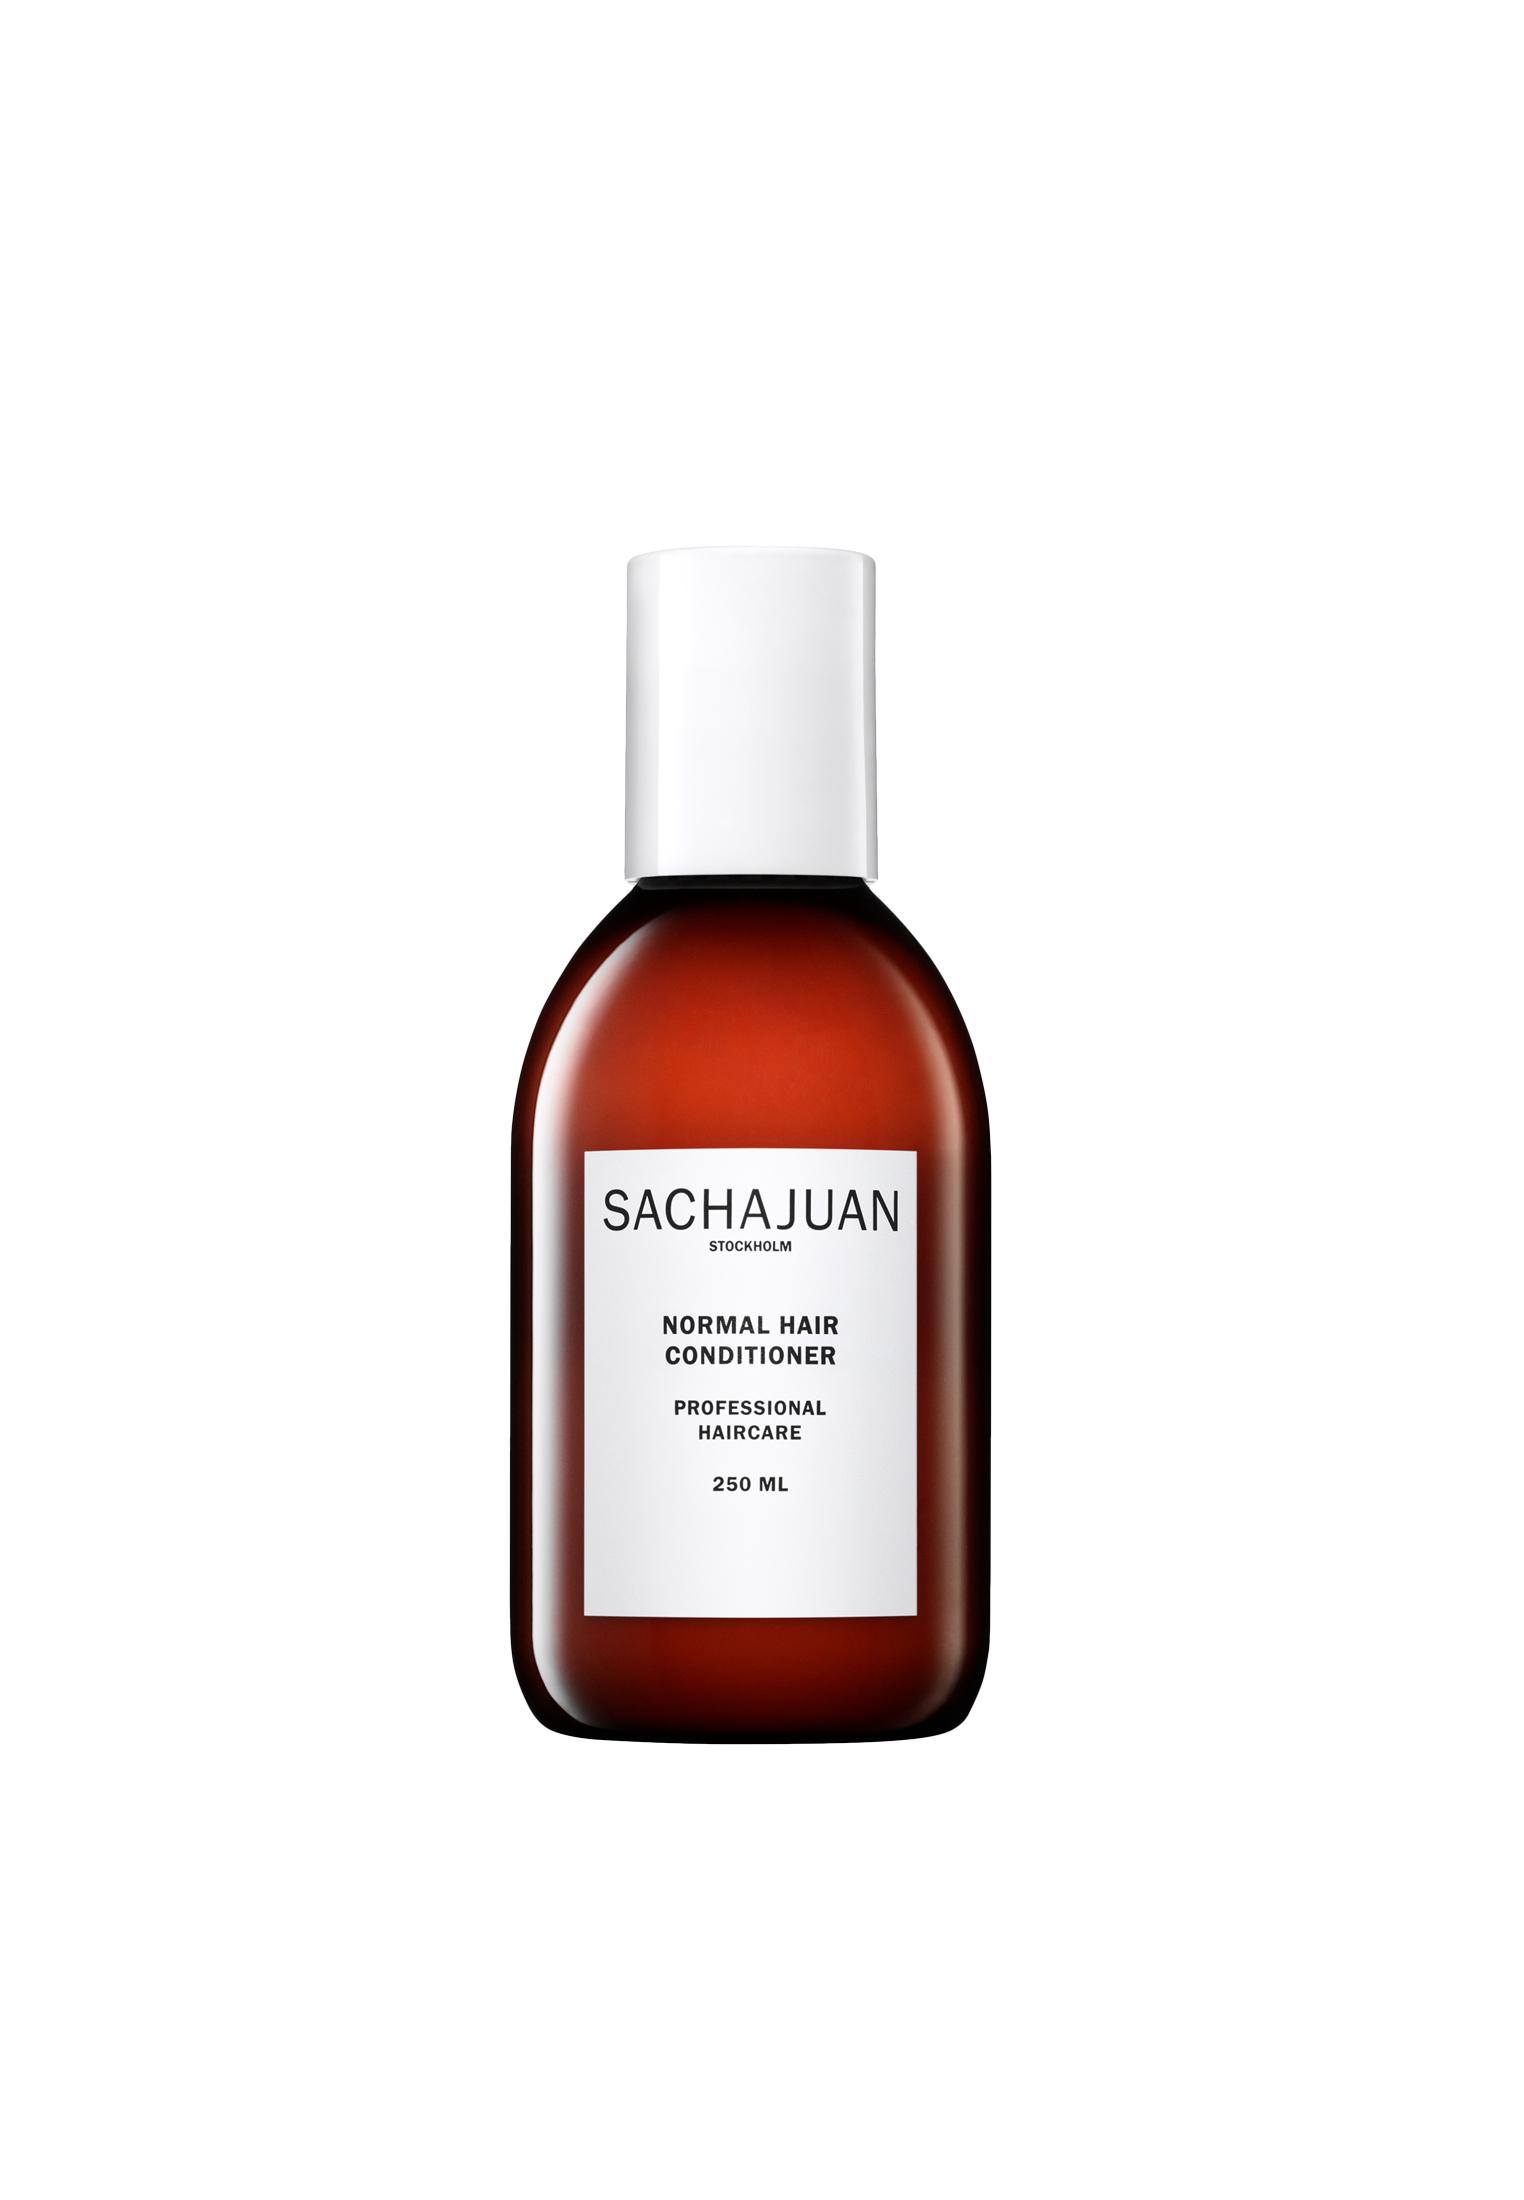 SACHAJUAN - Normal Hair Conditioner - 250 ml